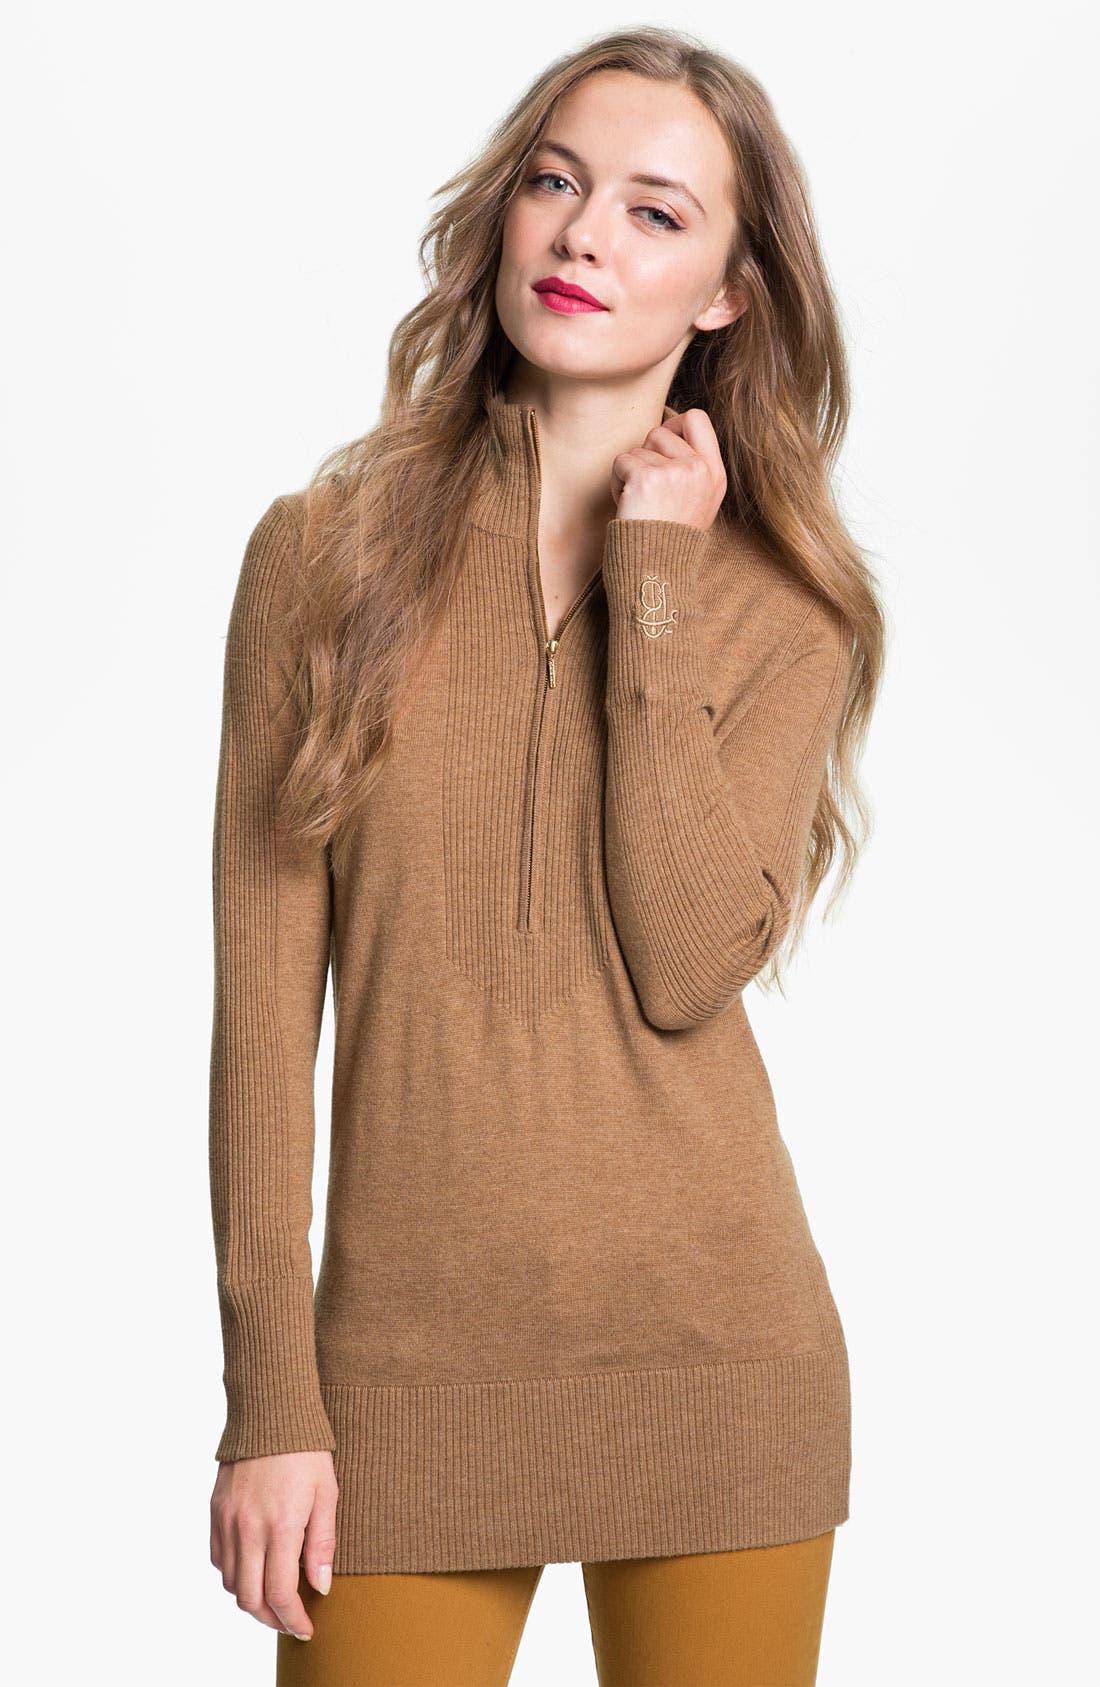 Alternate Image 1 Selected - Tory Burch 'Alora' Half Zip Sweater (Online Exclusive)